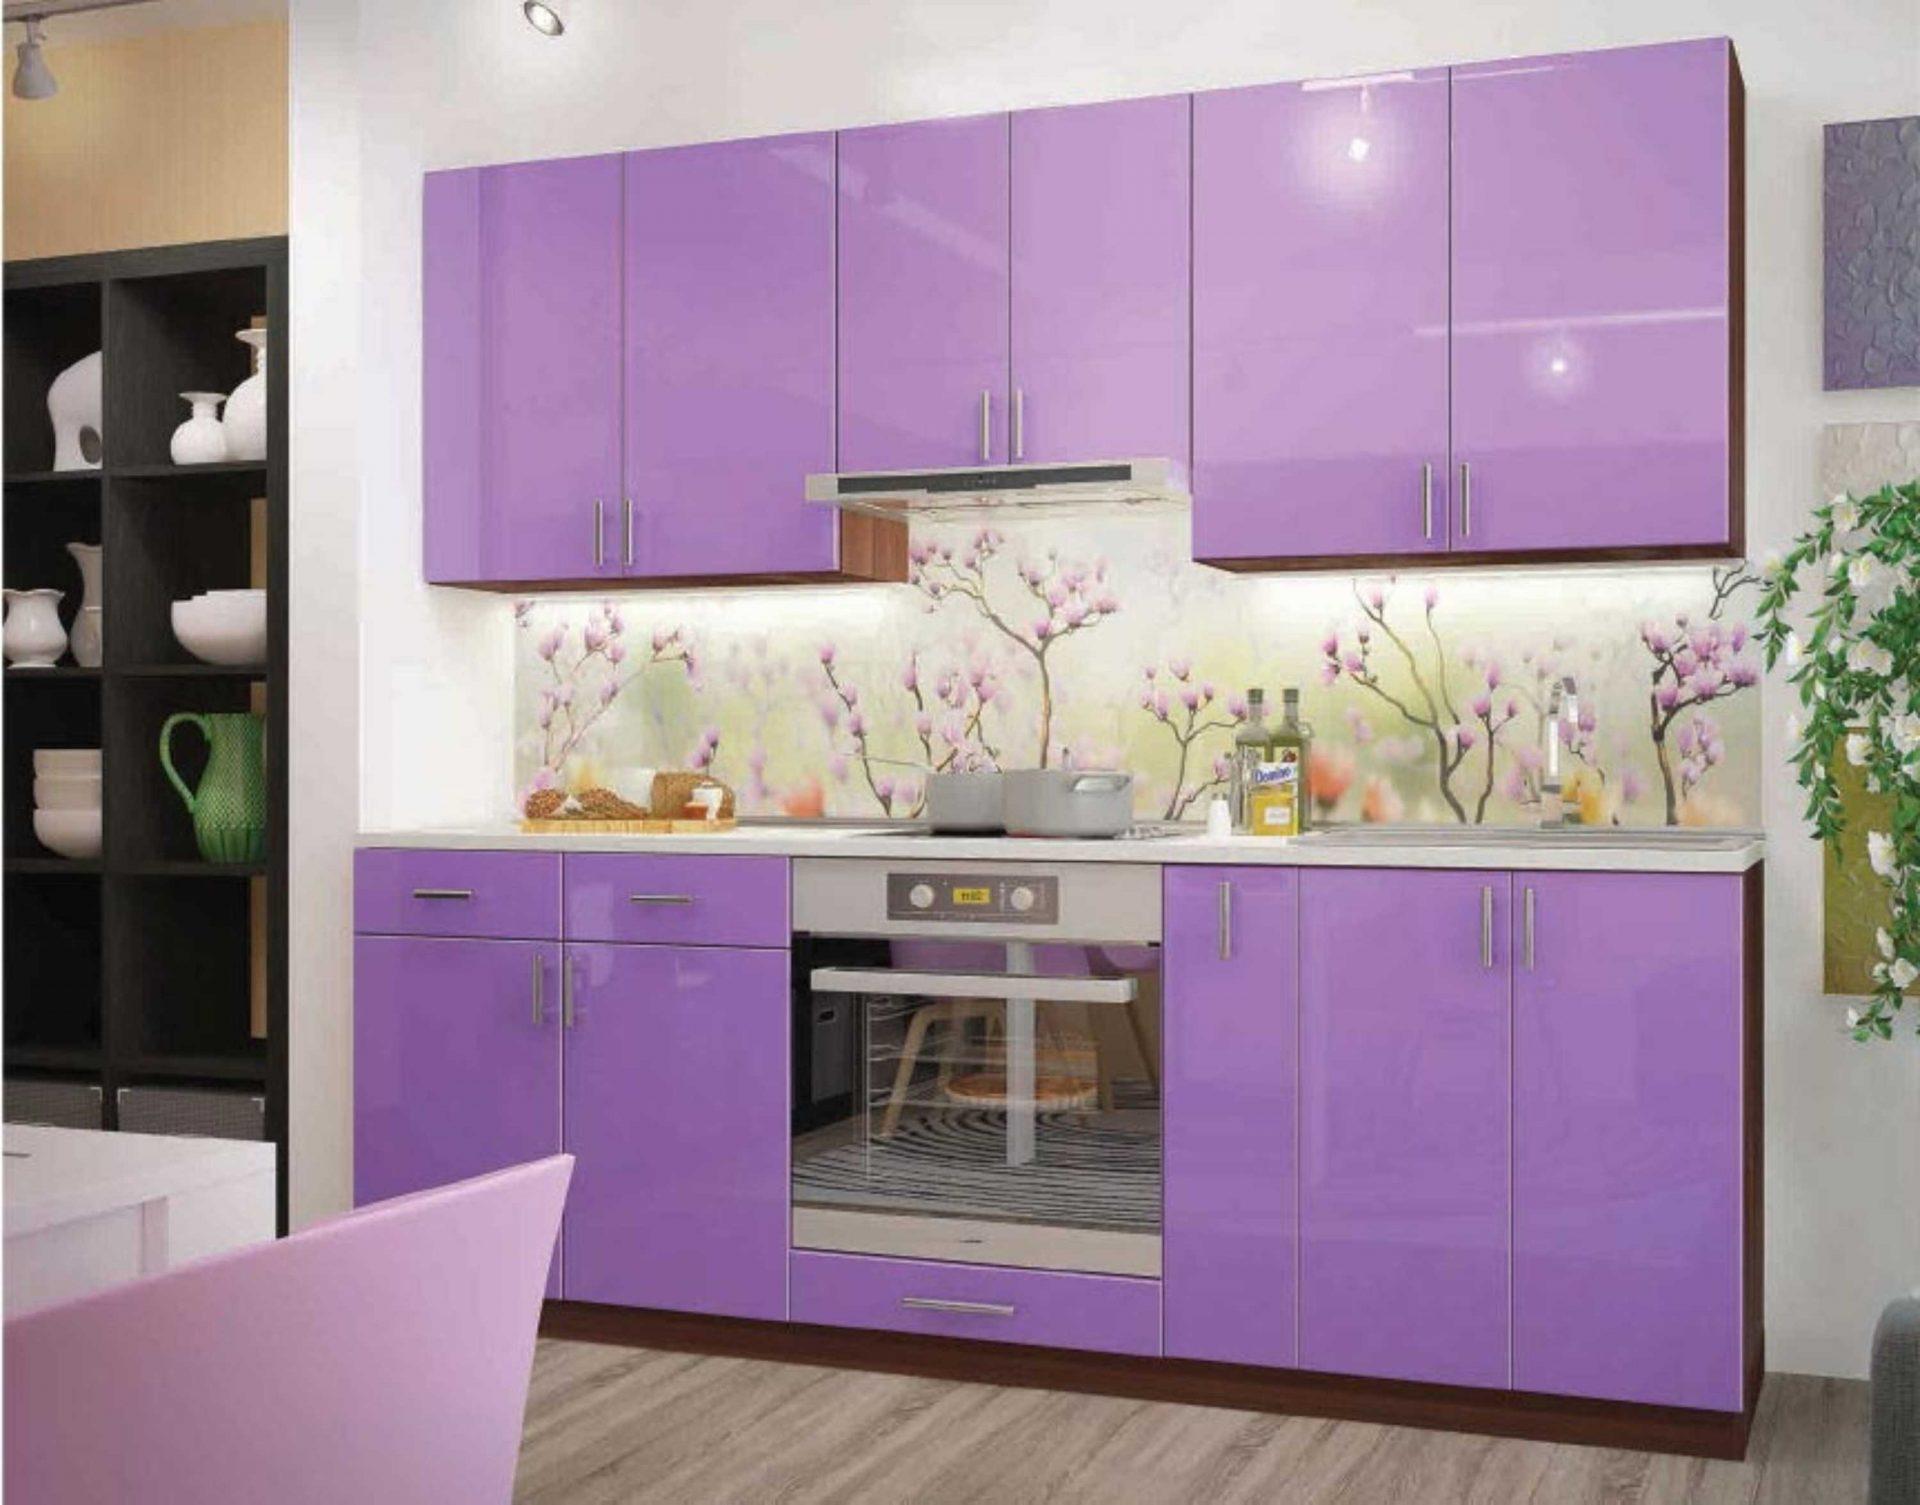 Фиолетовая прямая кухня